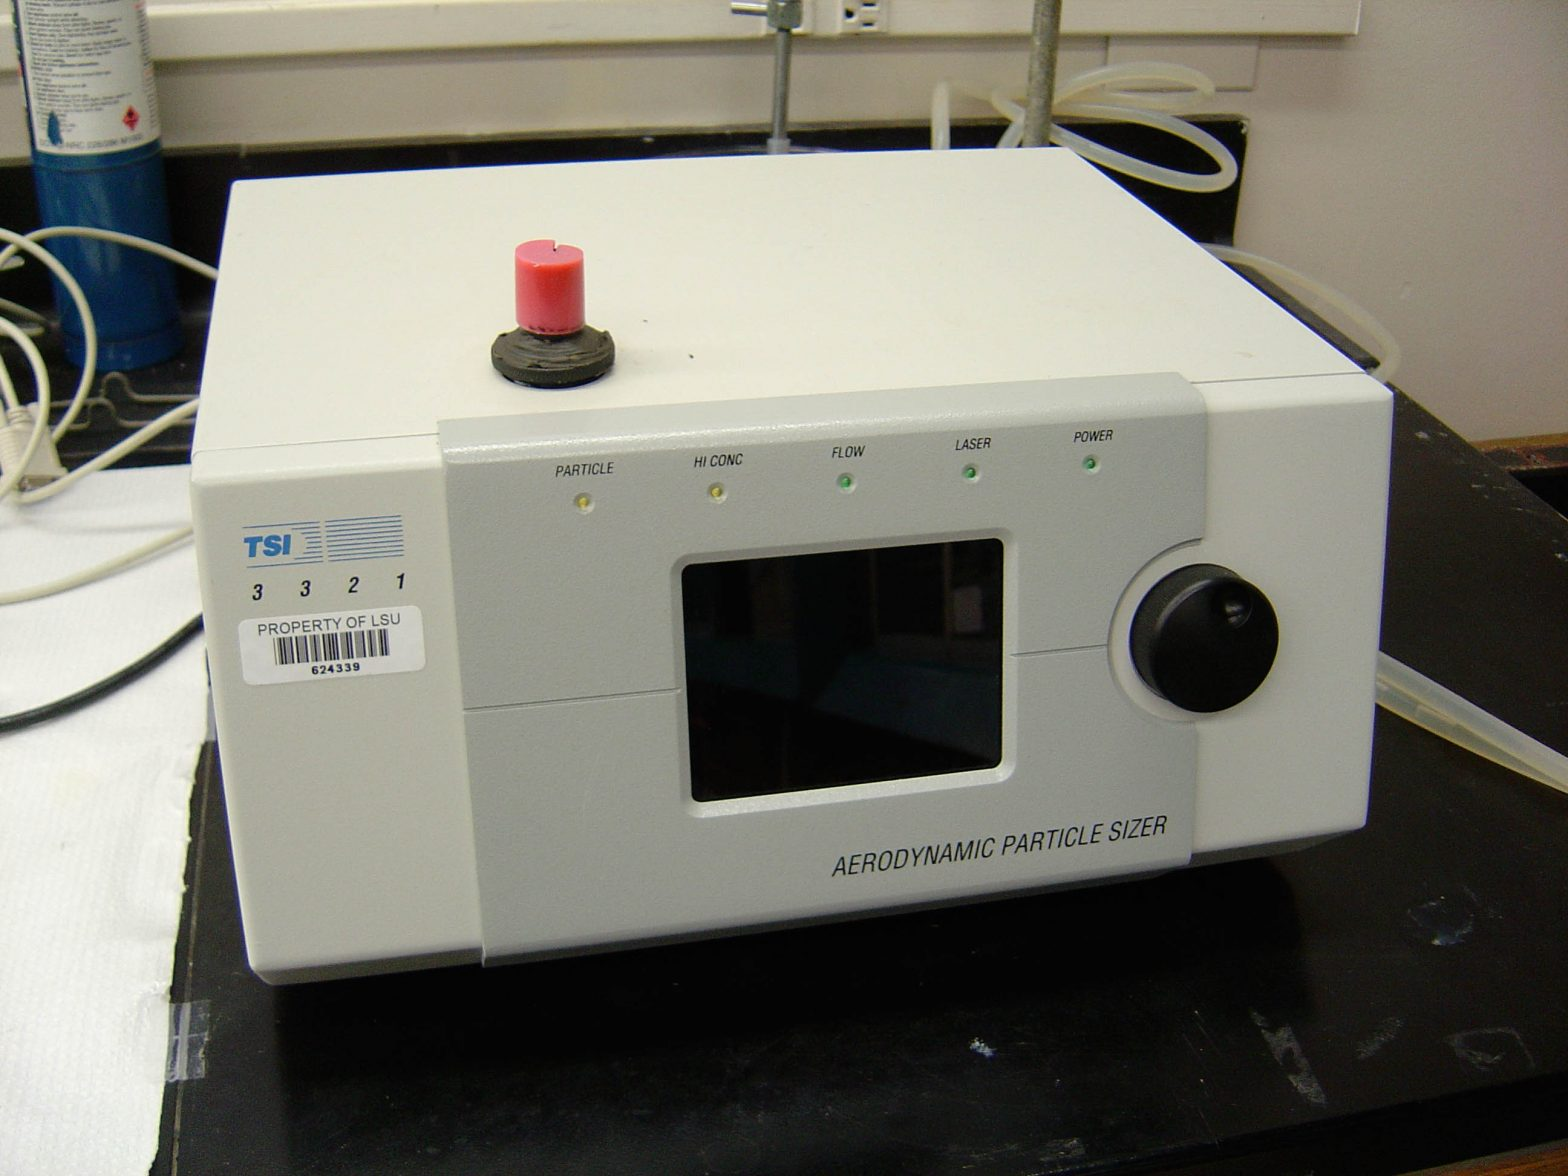 Aerodynamic particle sizer